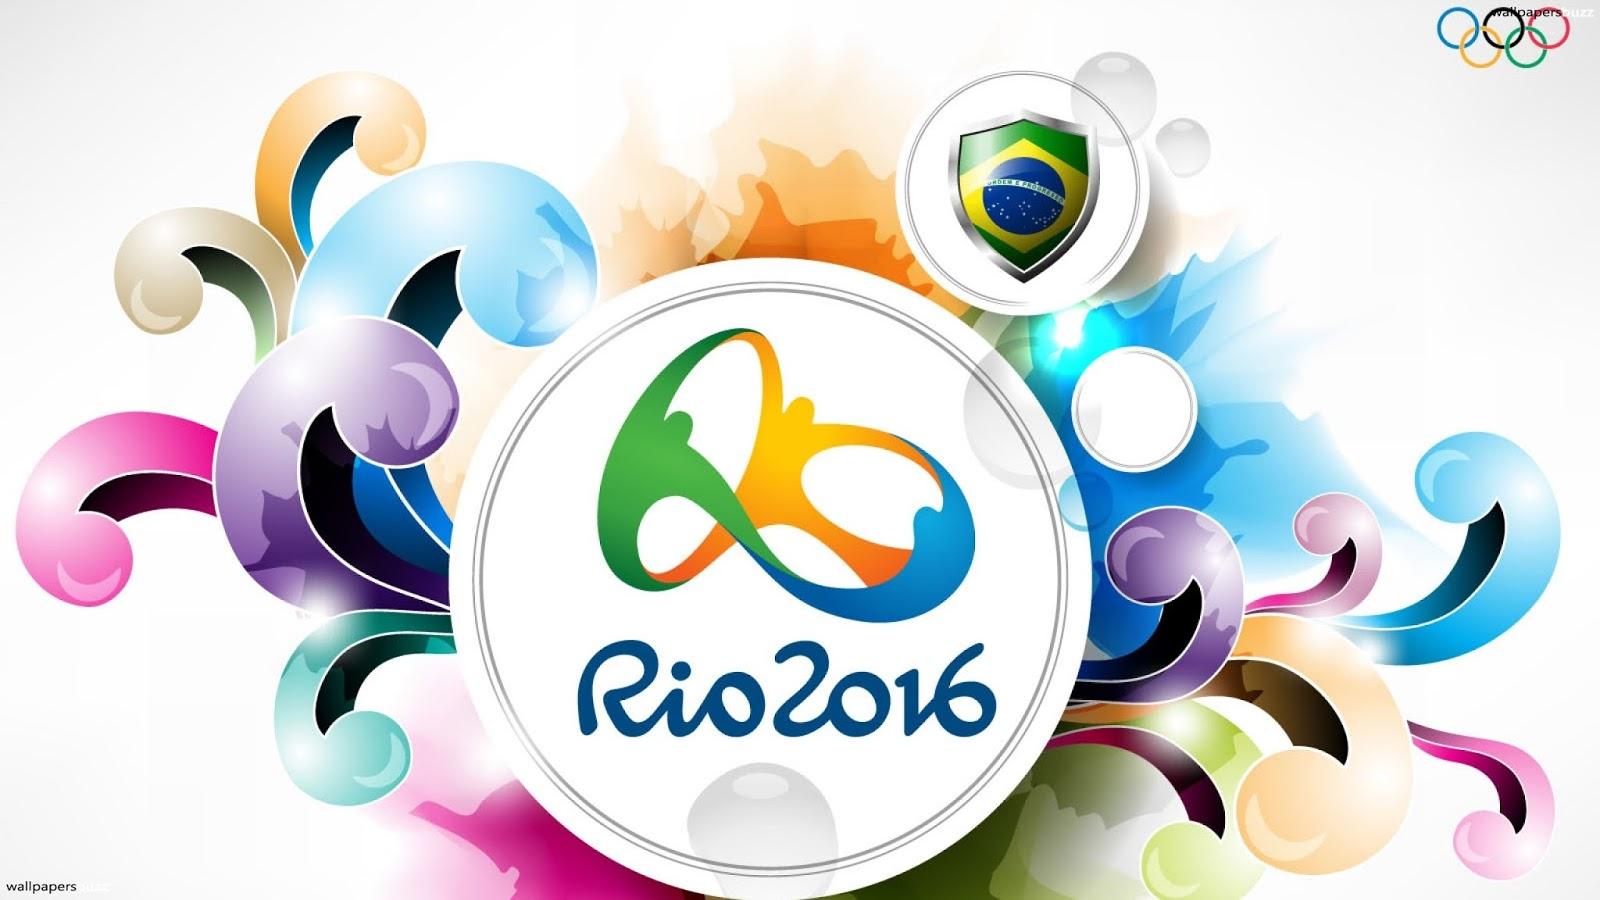 Toquinho, Jorge Ben Jor- Carolina Carol Bela: testo tradotto - Canzone Olimpiadi RIO 2016 Traduzione